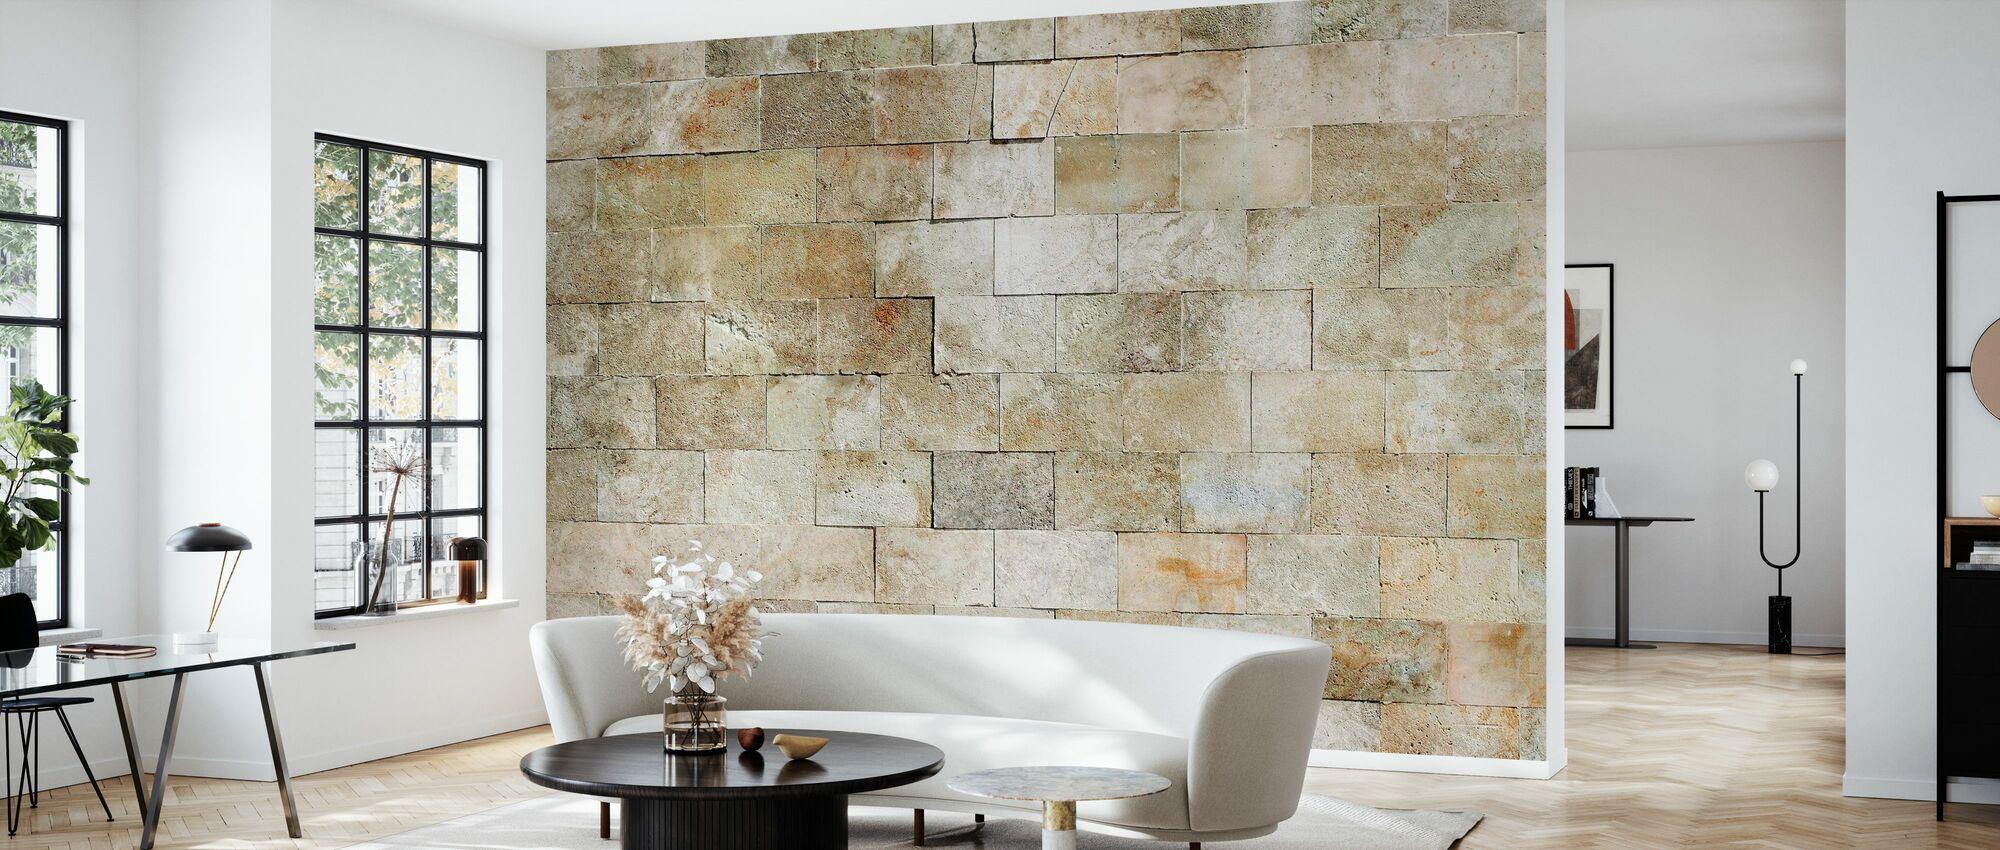 Flislagt steinmur - Tapet - Stue